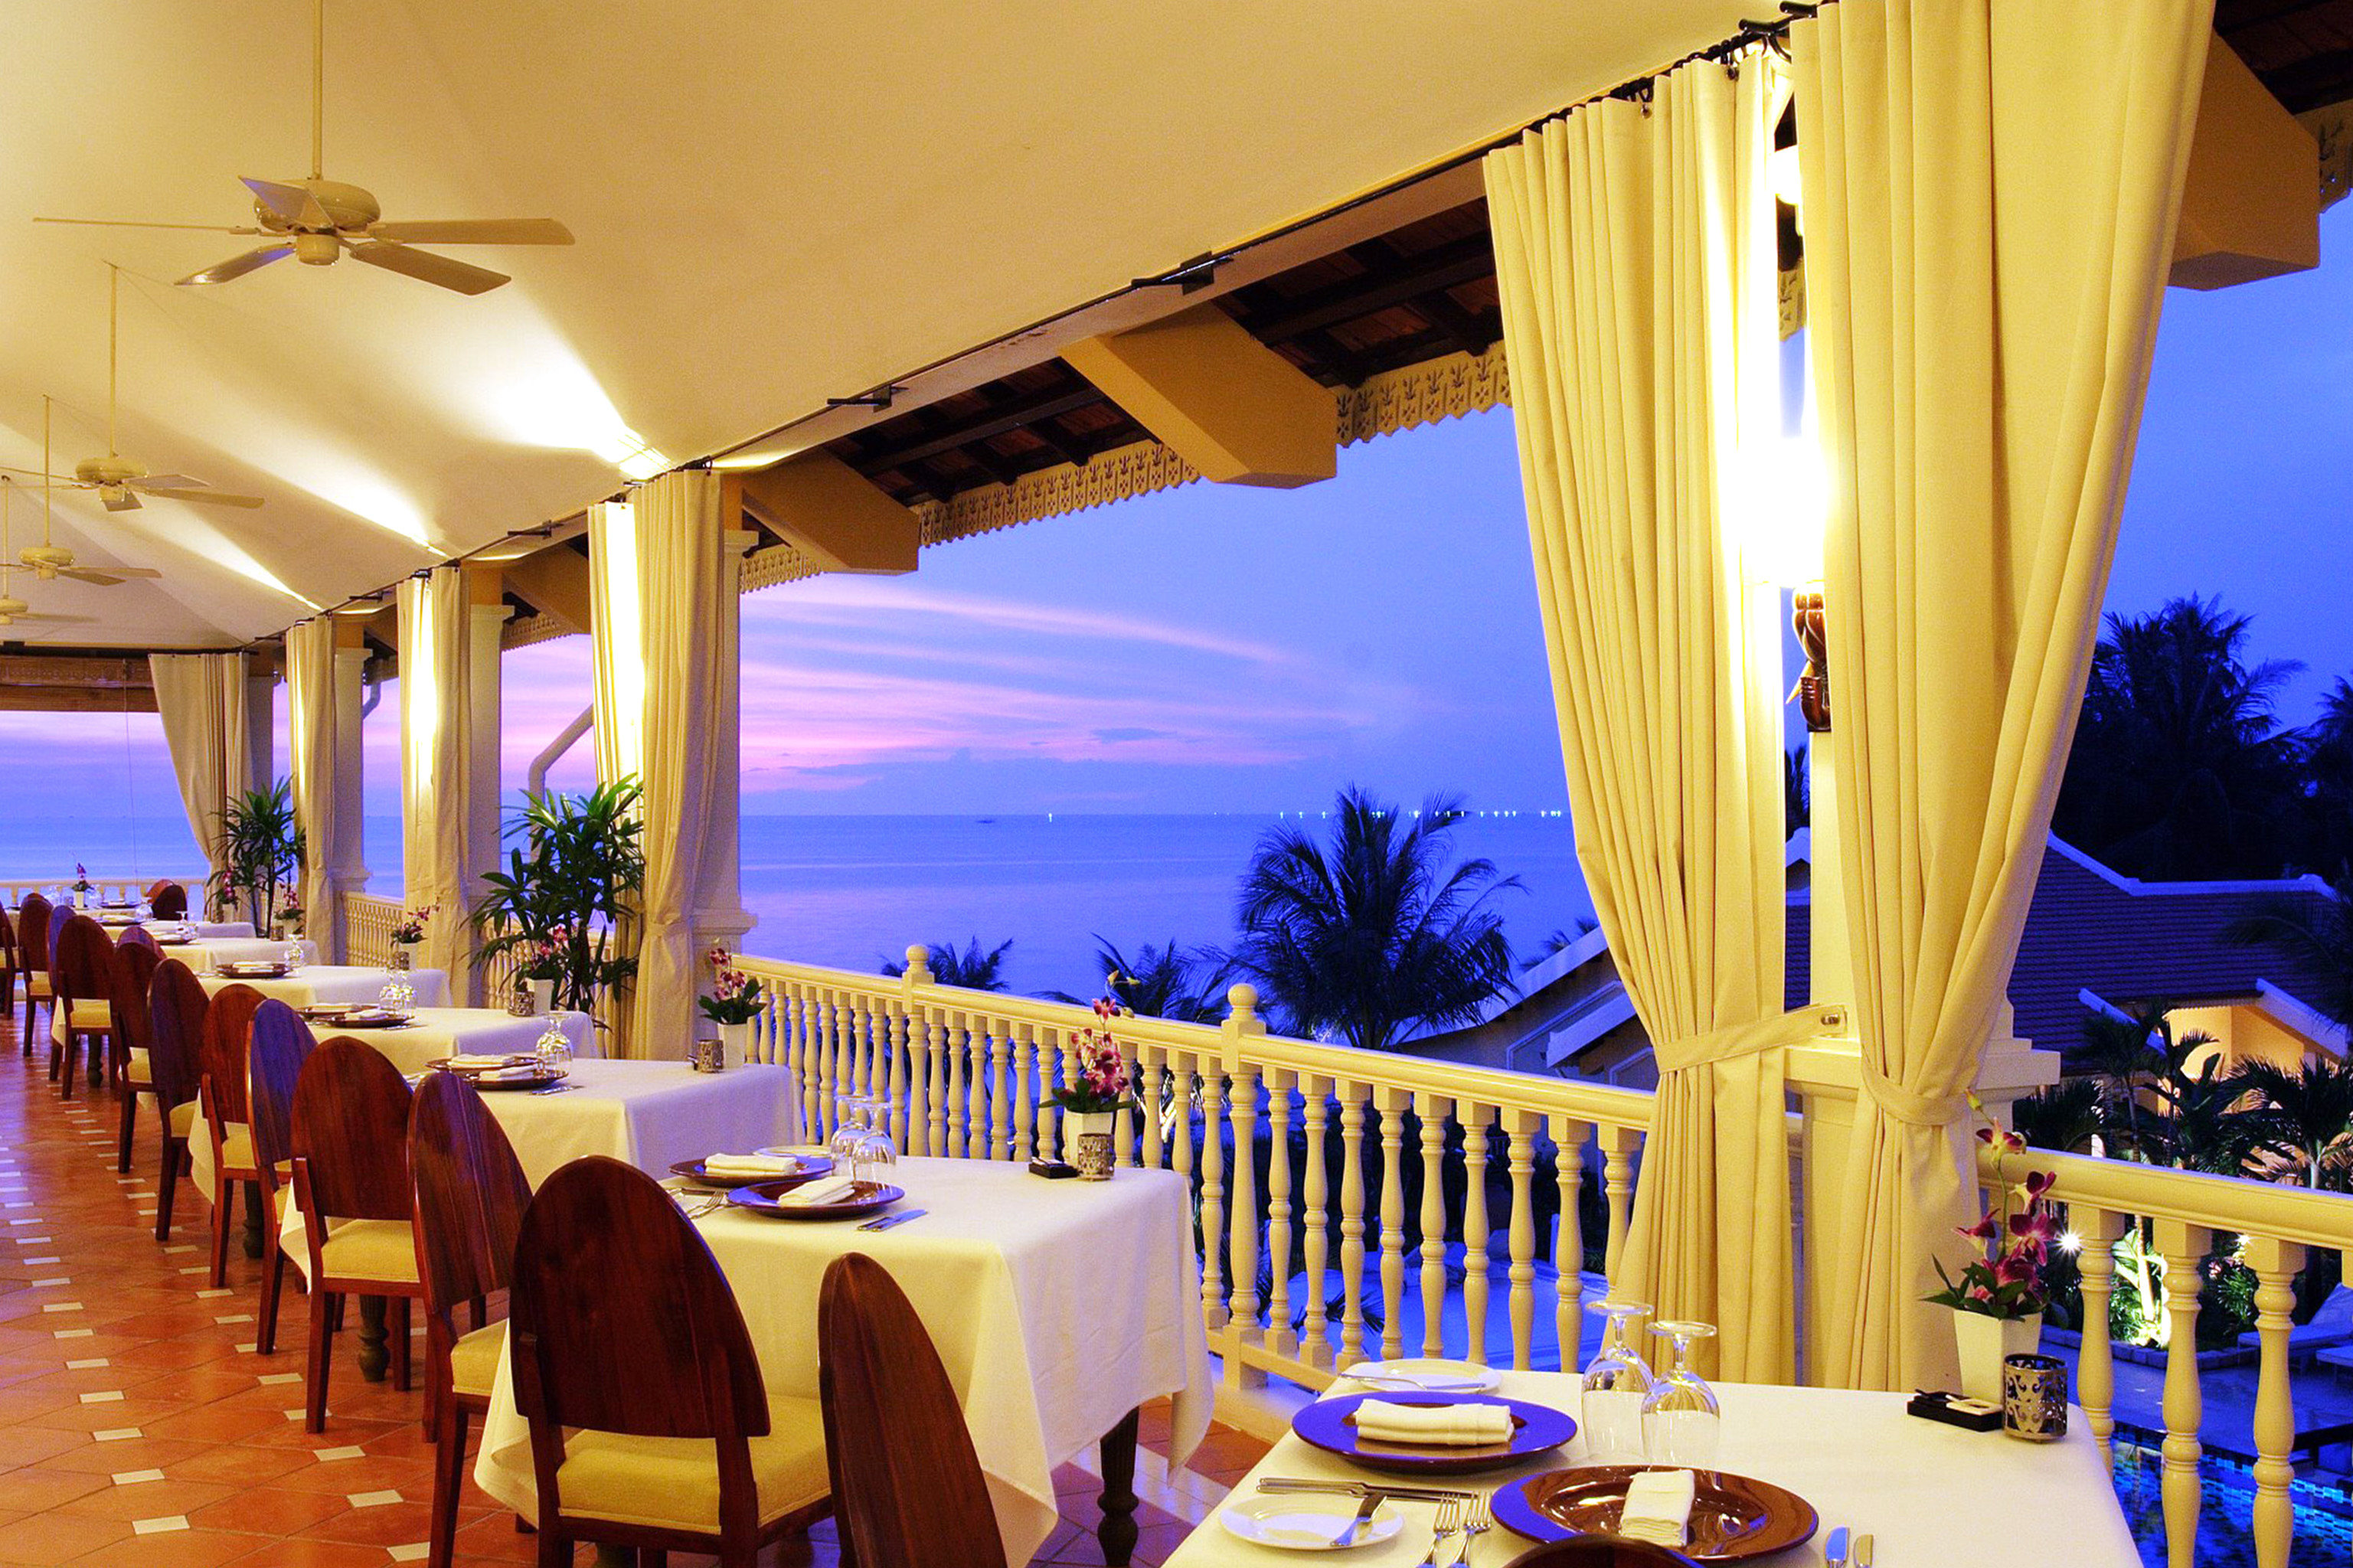 Beachfront Dining Drink Eat Island Patio Resort Romantic Terrace Waterfront chair restaurant function hall Villa